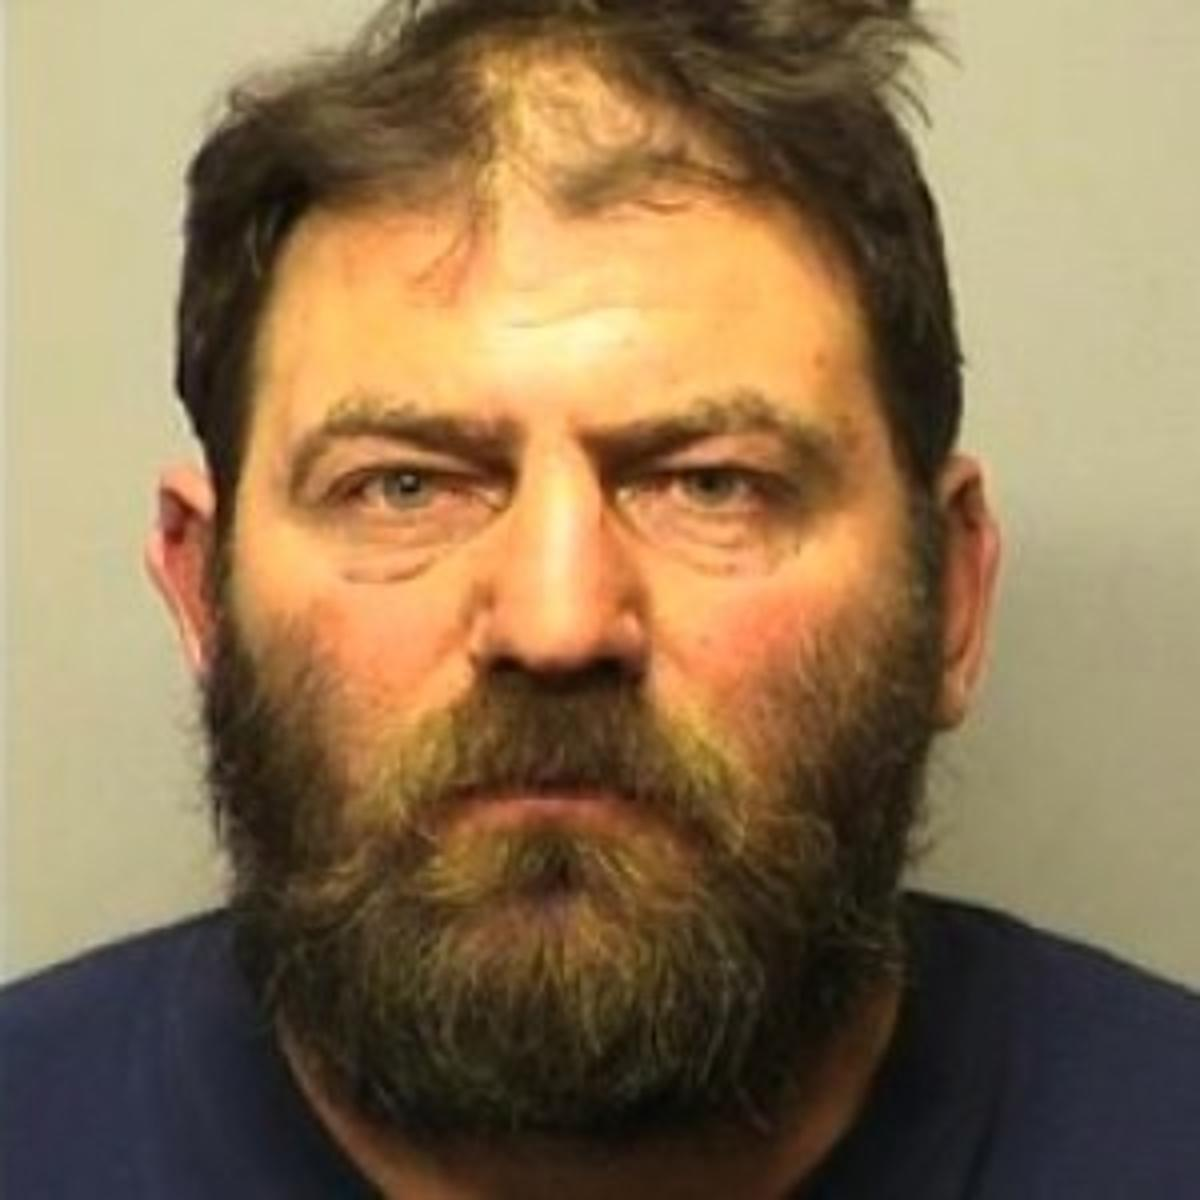 Go-kart racing leads to arrest | Porter County News